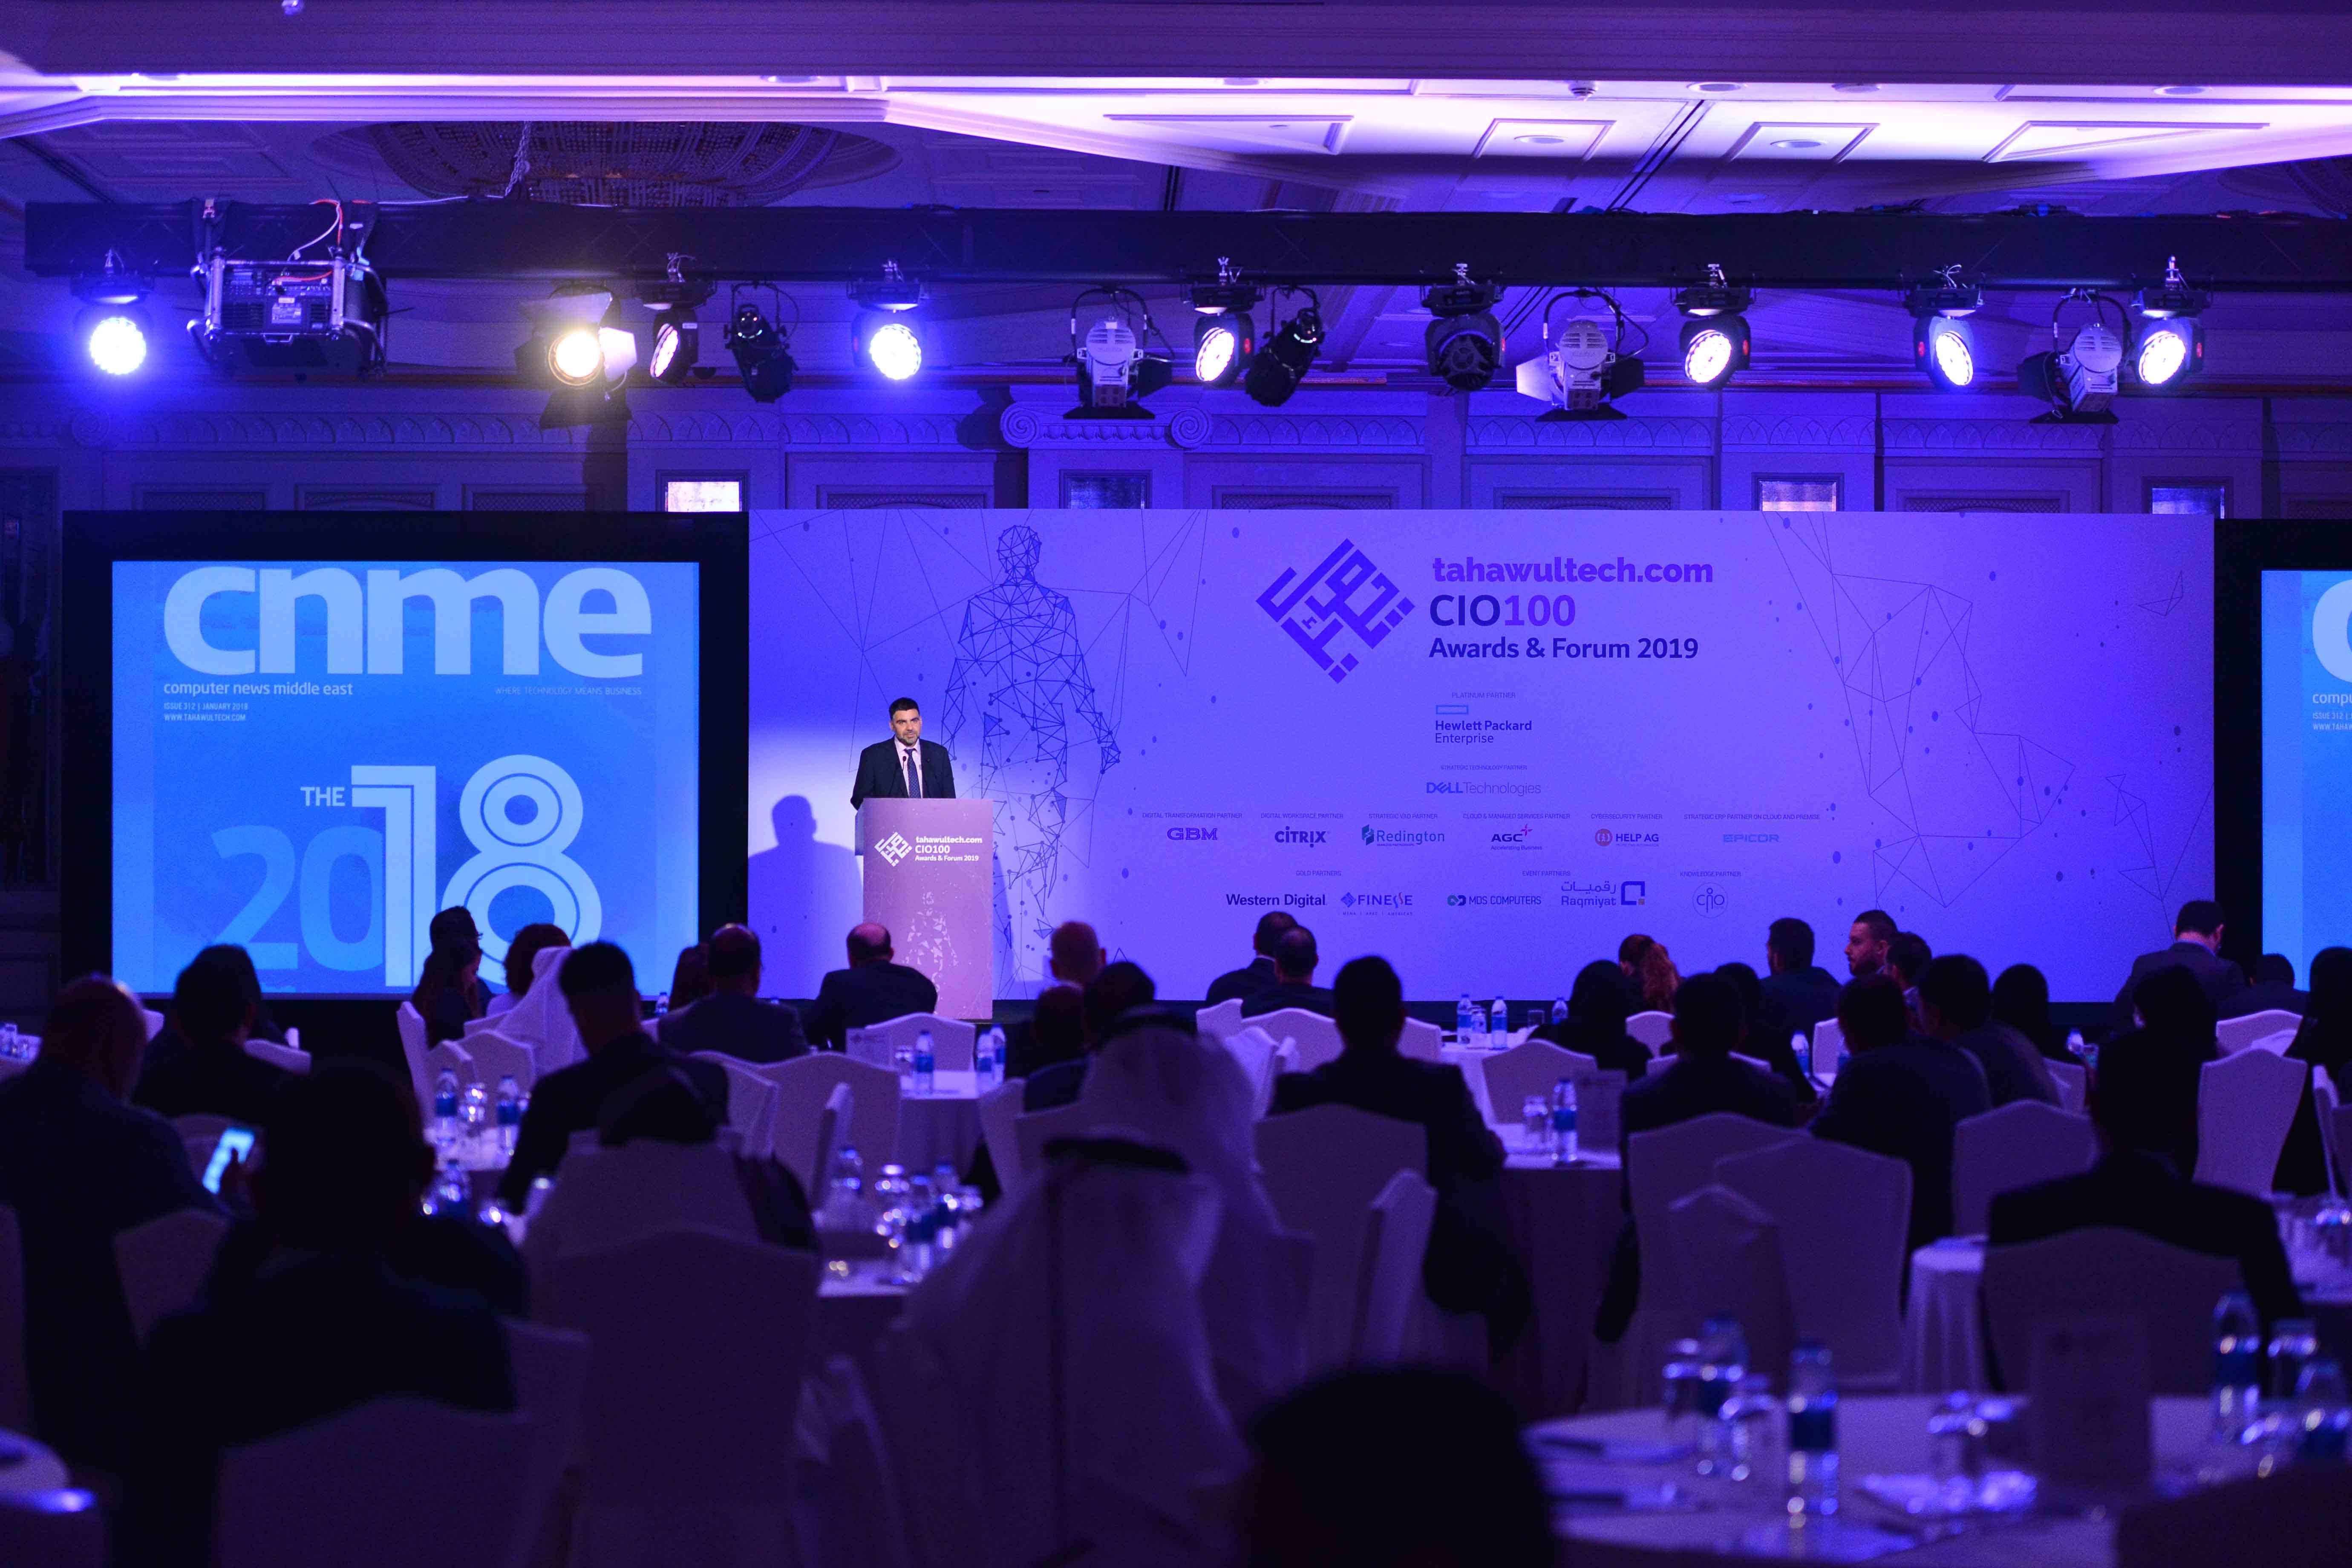 CIO 100 Awards 2019: winners announced | TahawulTech com